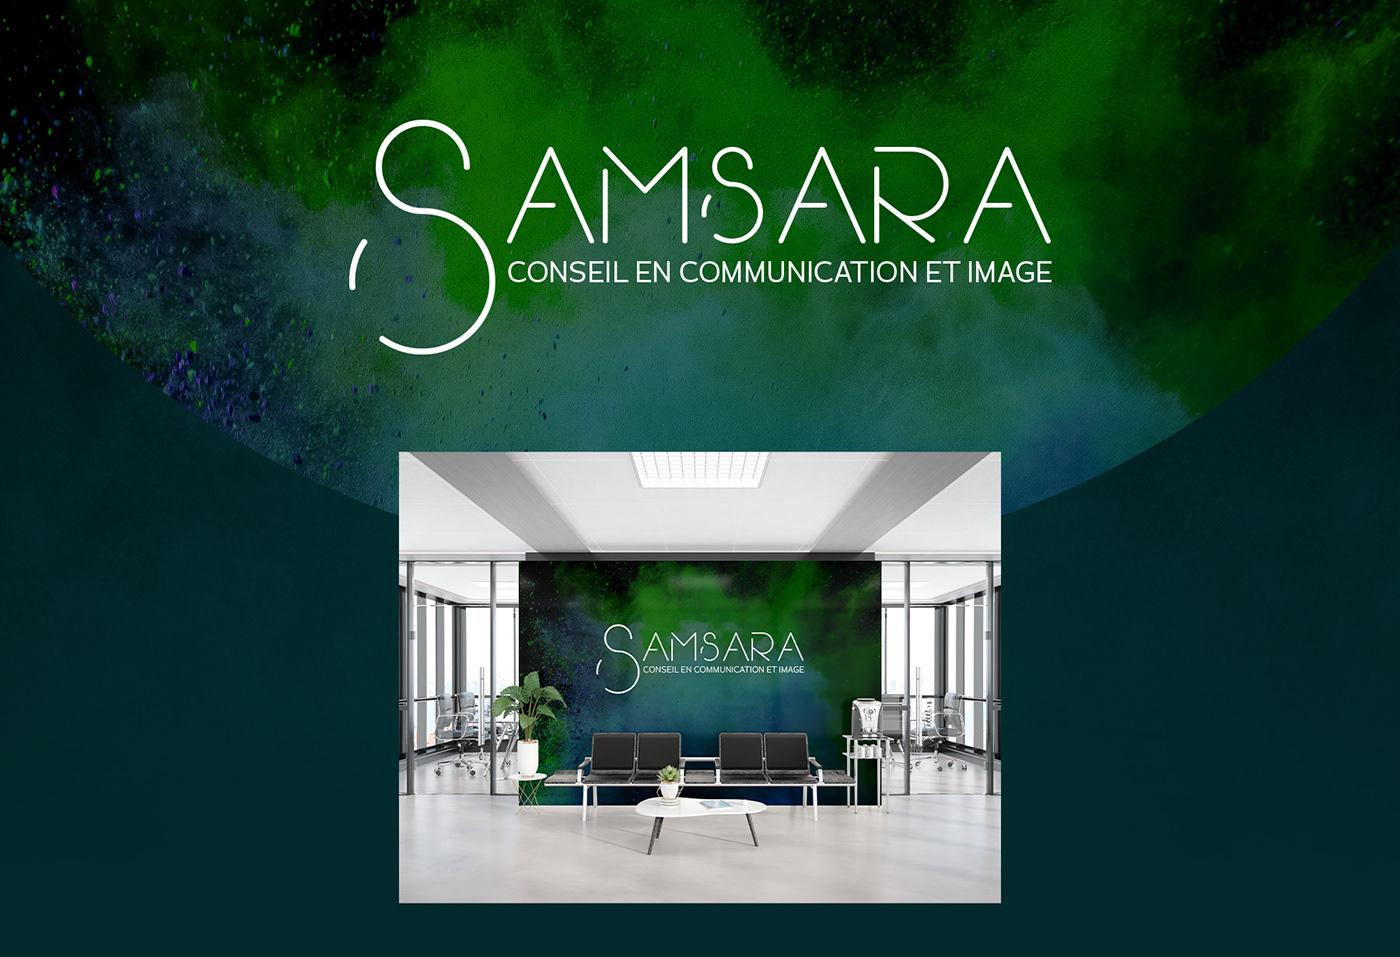 logo Logotype identité visuelle Corporate Design corporate design samsara